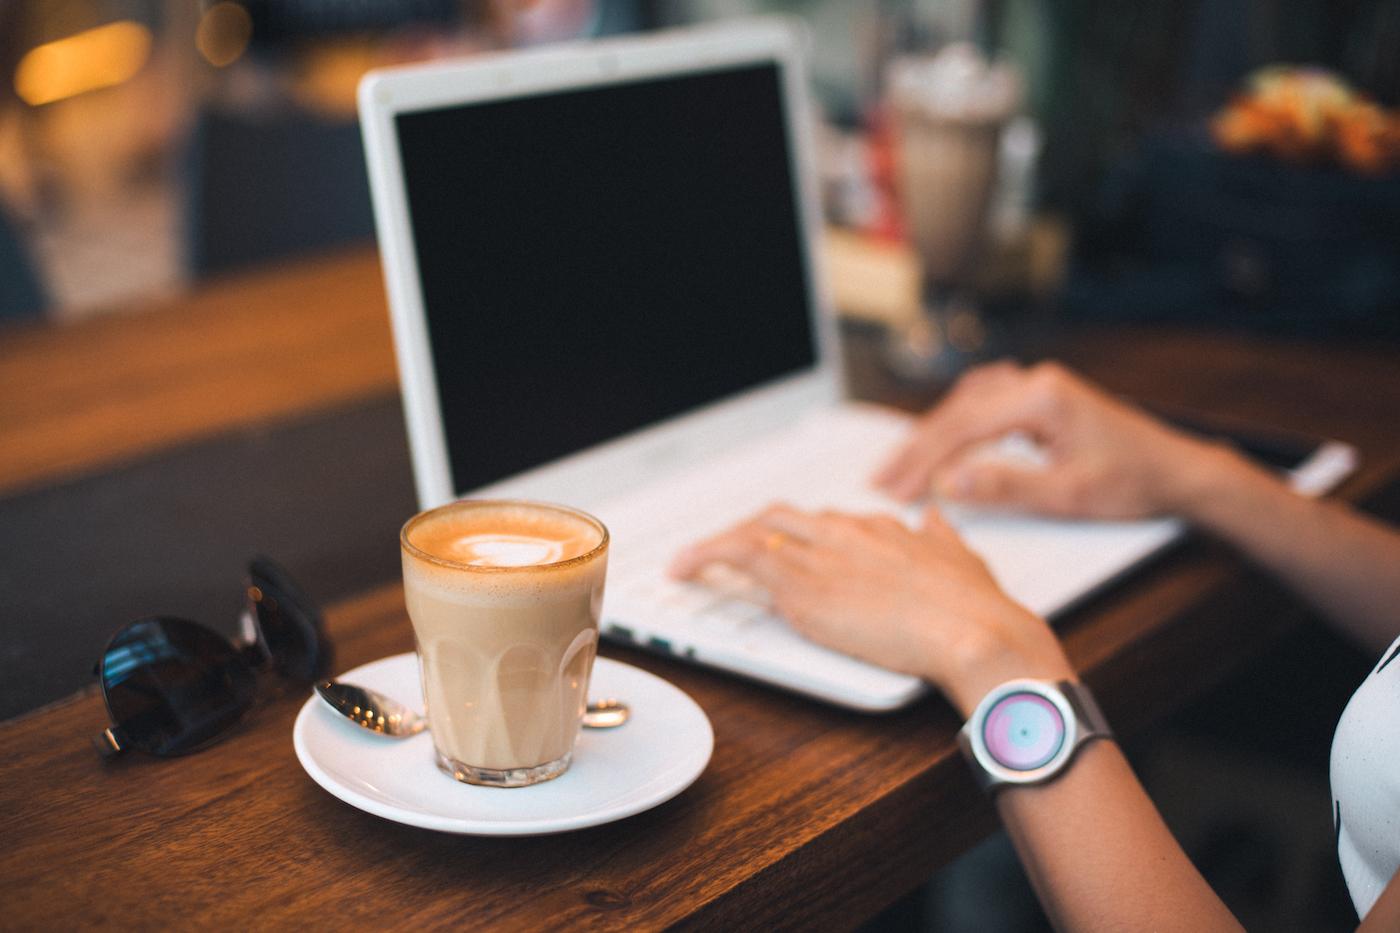 Email Marketing Strategy: Customer Retention